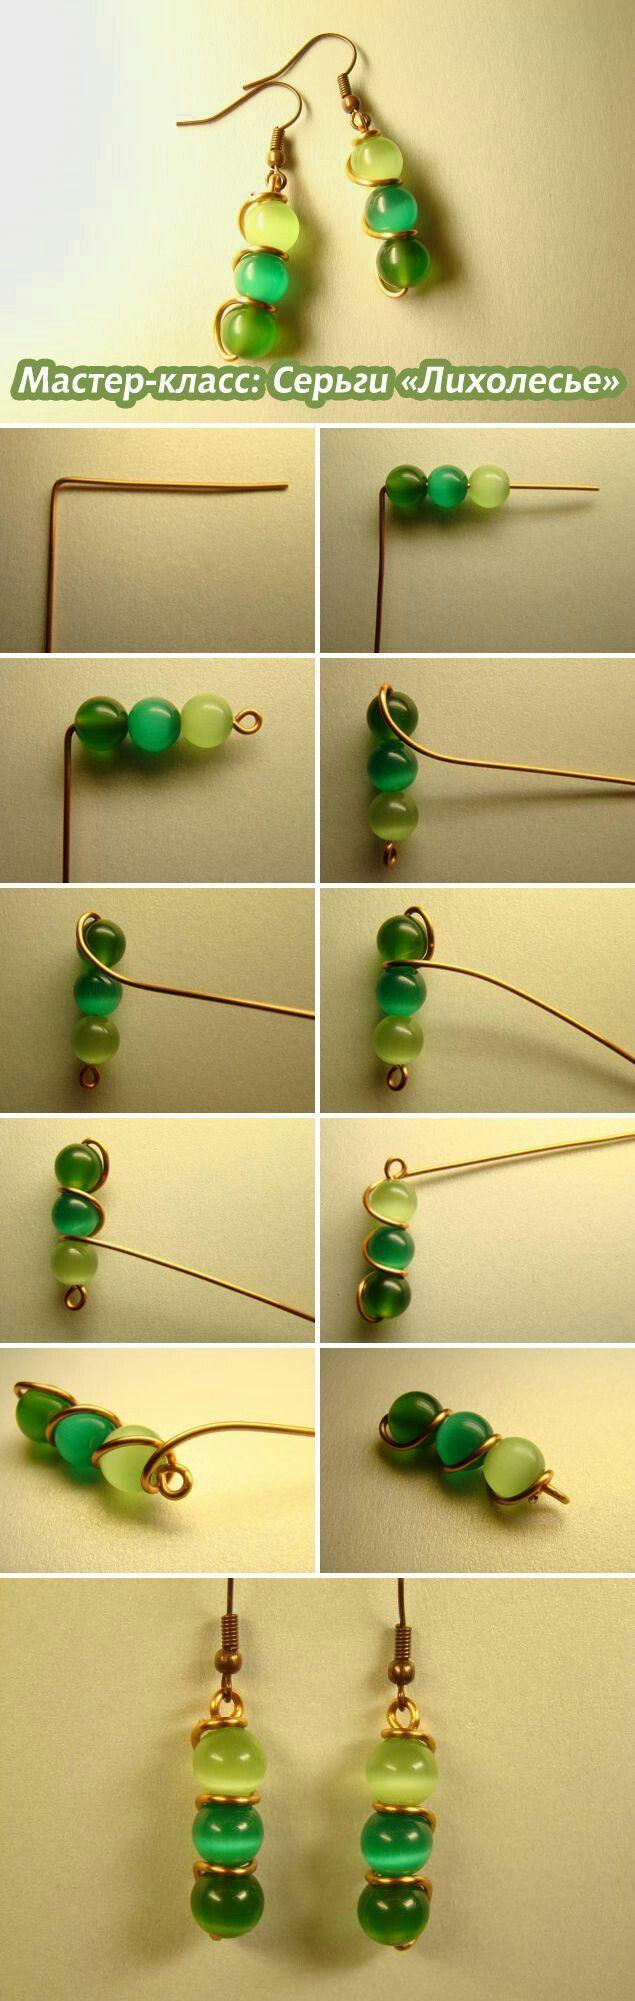 How to make wrapped wire earrings // DIY Tutorial // Como hacer pendientes con alambre. Alambrismo.